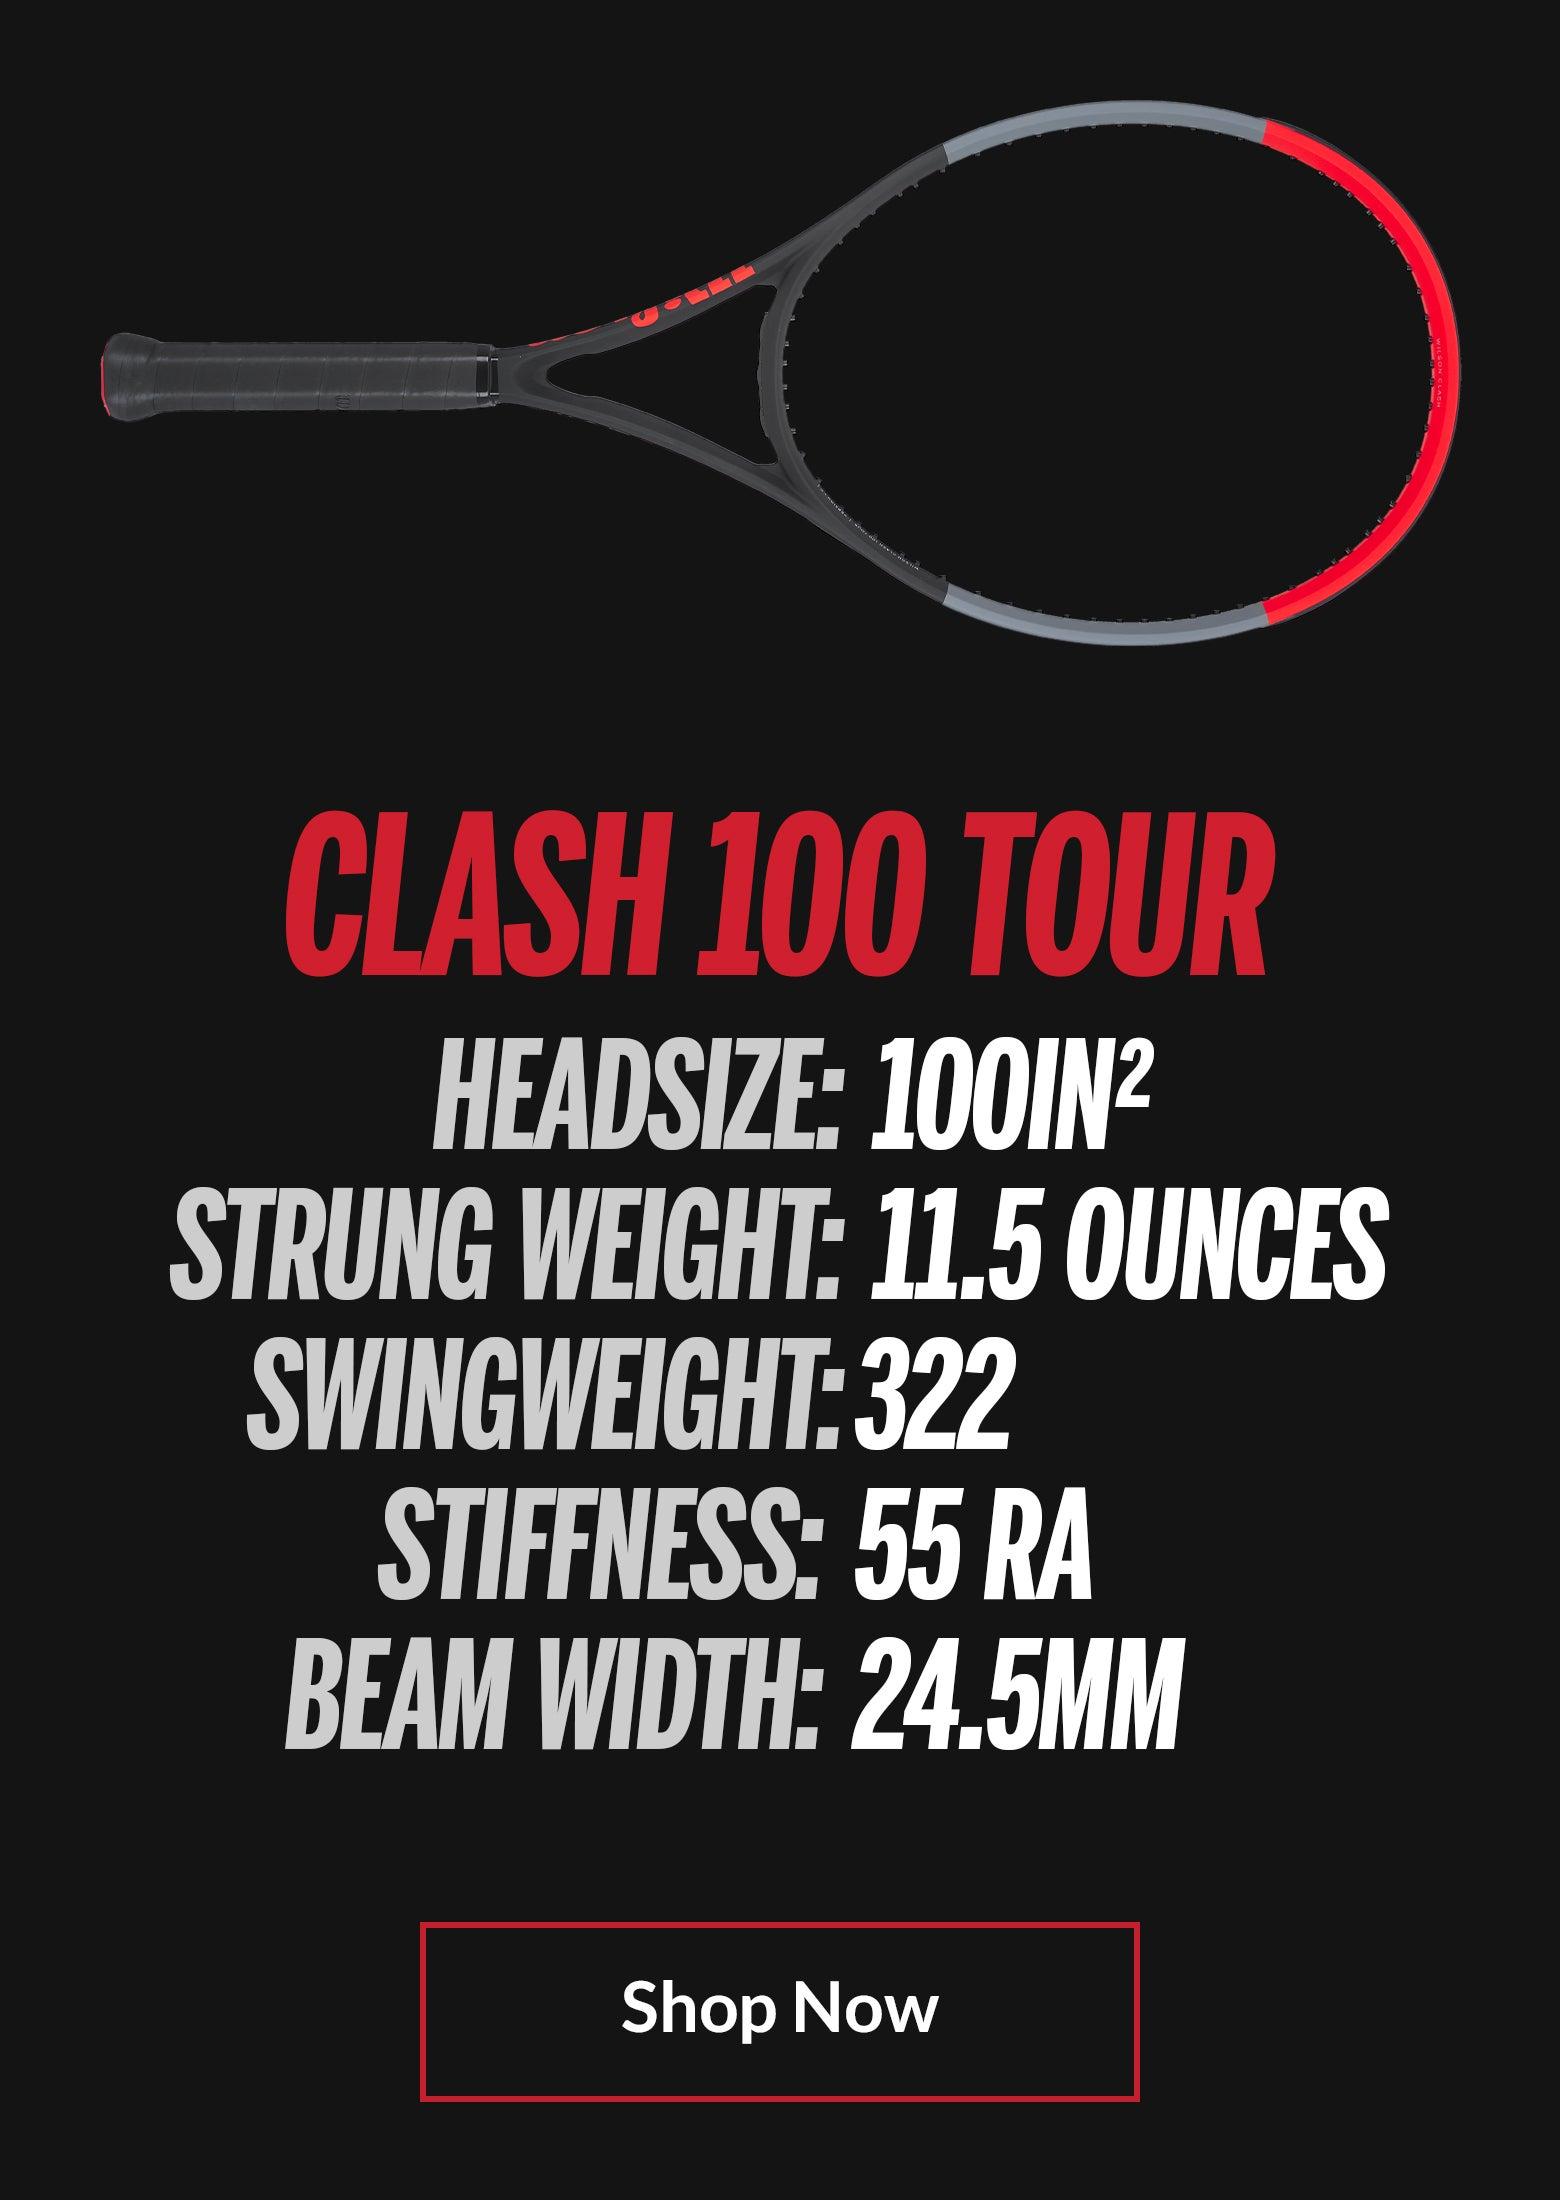 Clash 100 Tour Specs